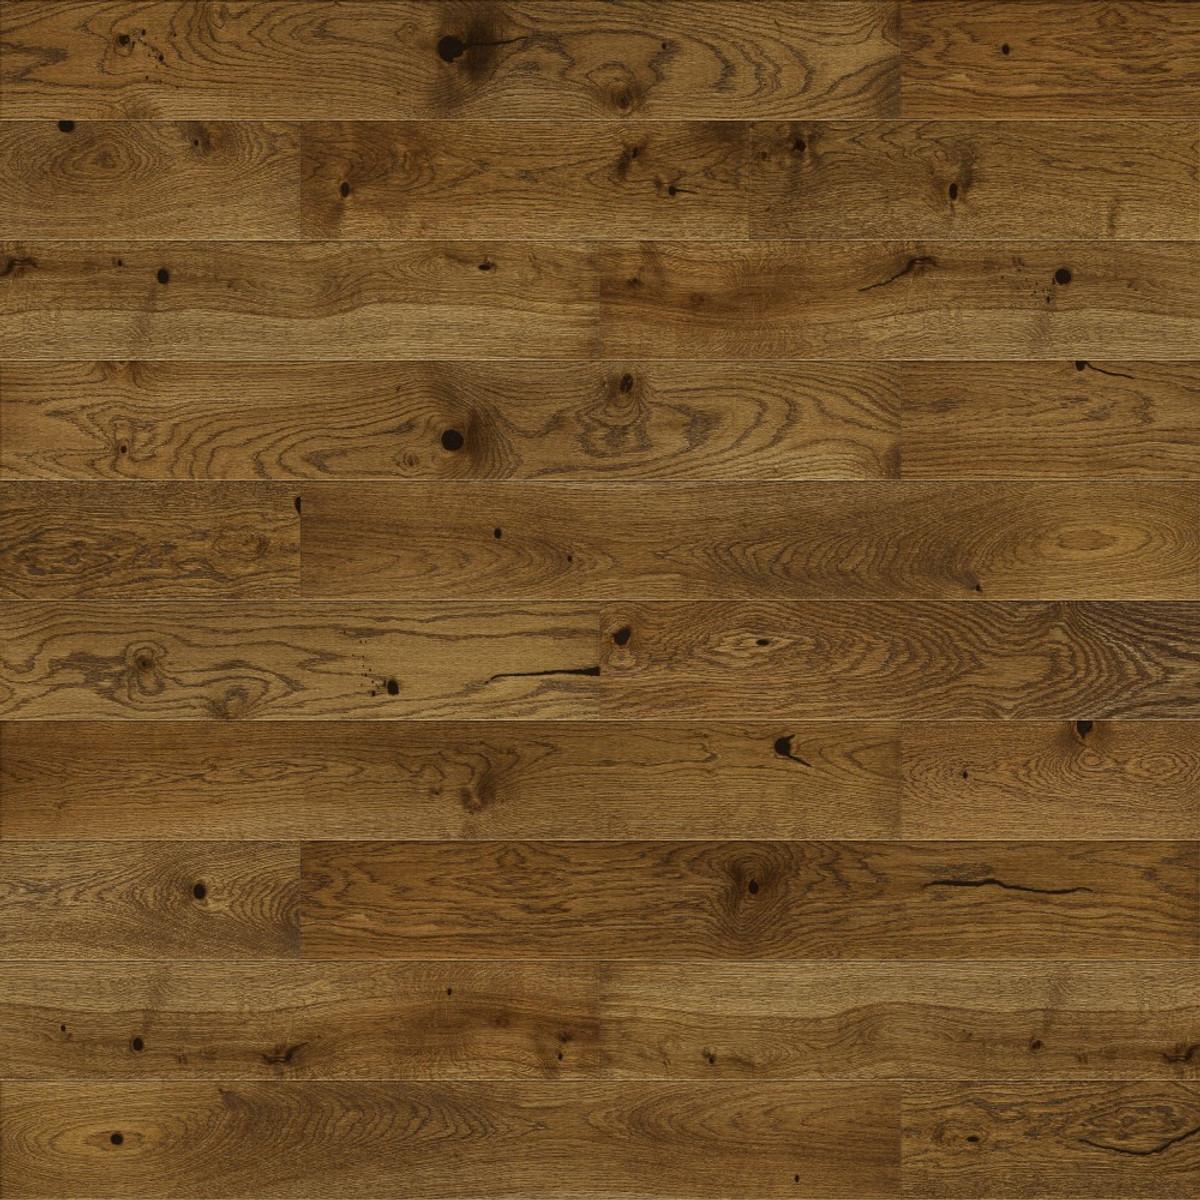 Tuscany Xpress Click Country Walnut Boardshot Engineered Wood Flooring ( Per 2.26m2 Pack ) www.tuscanytiles.co.uk